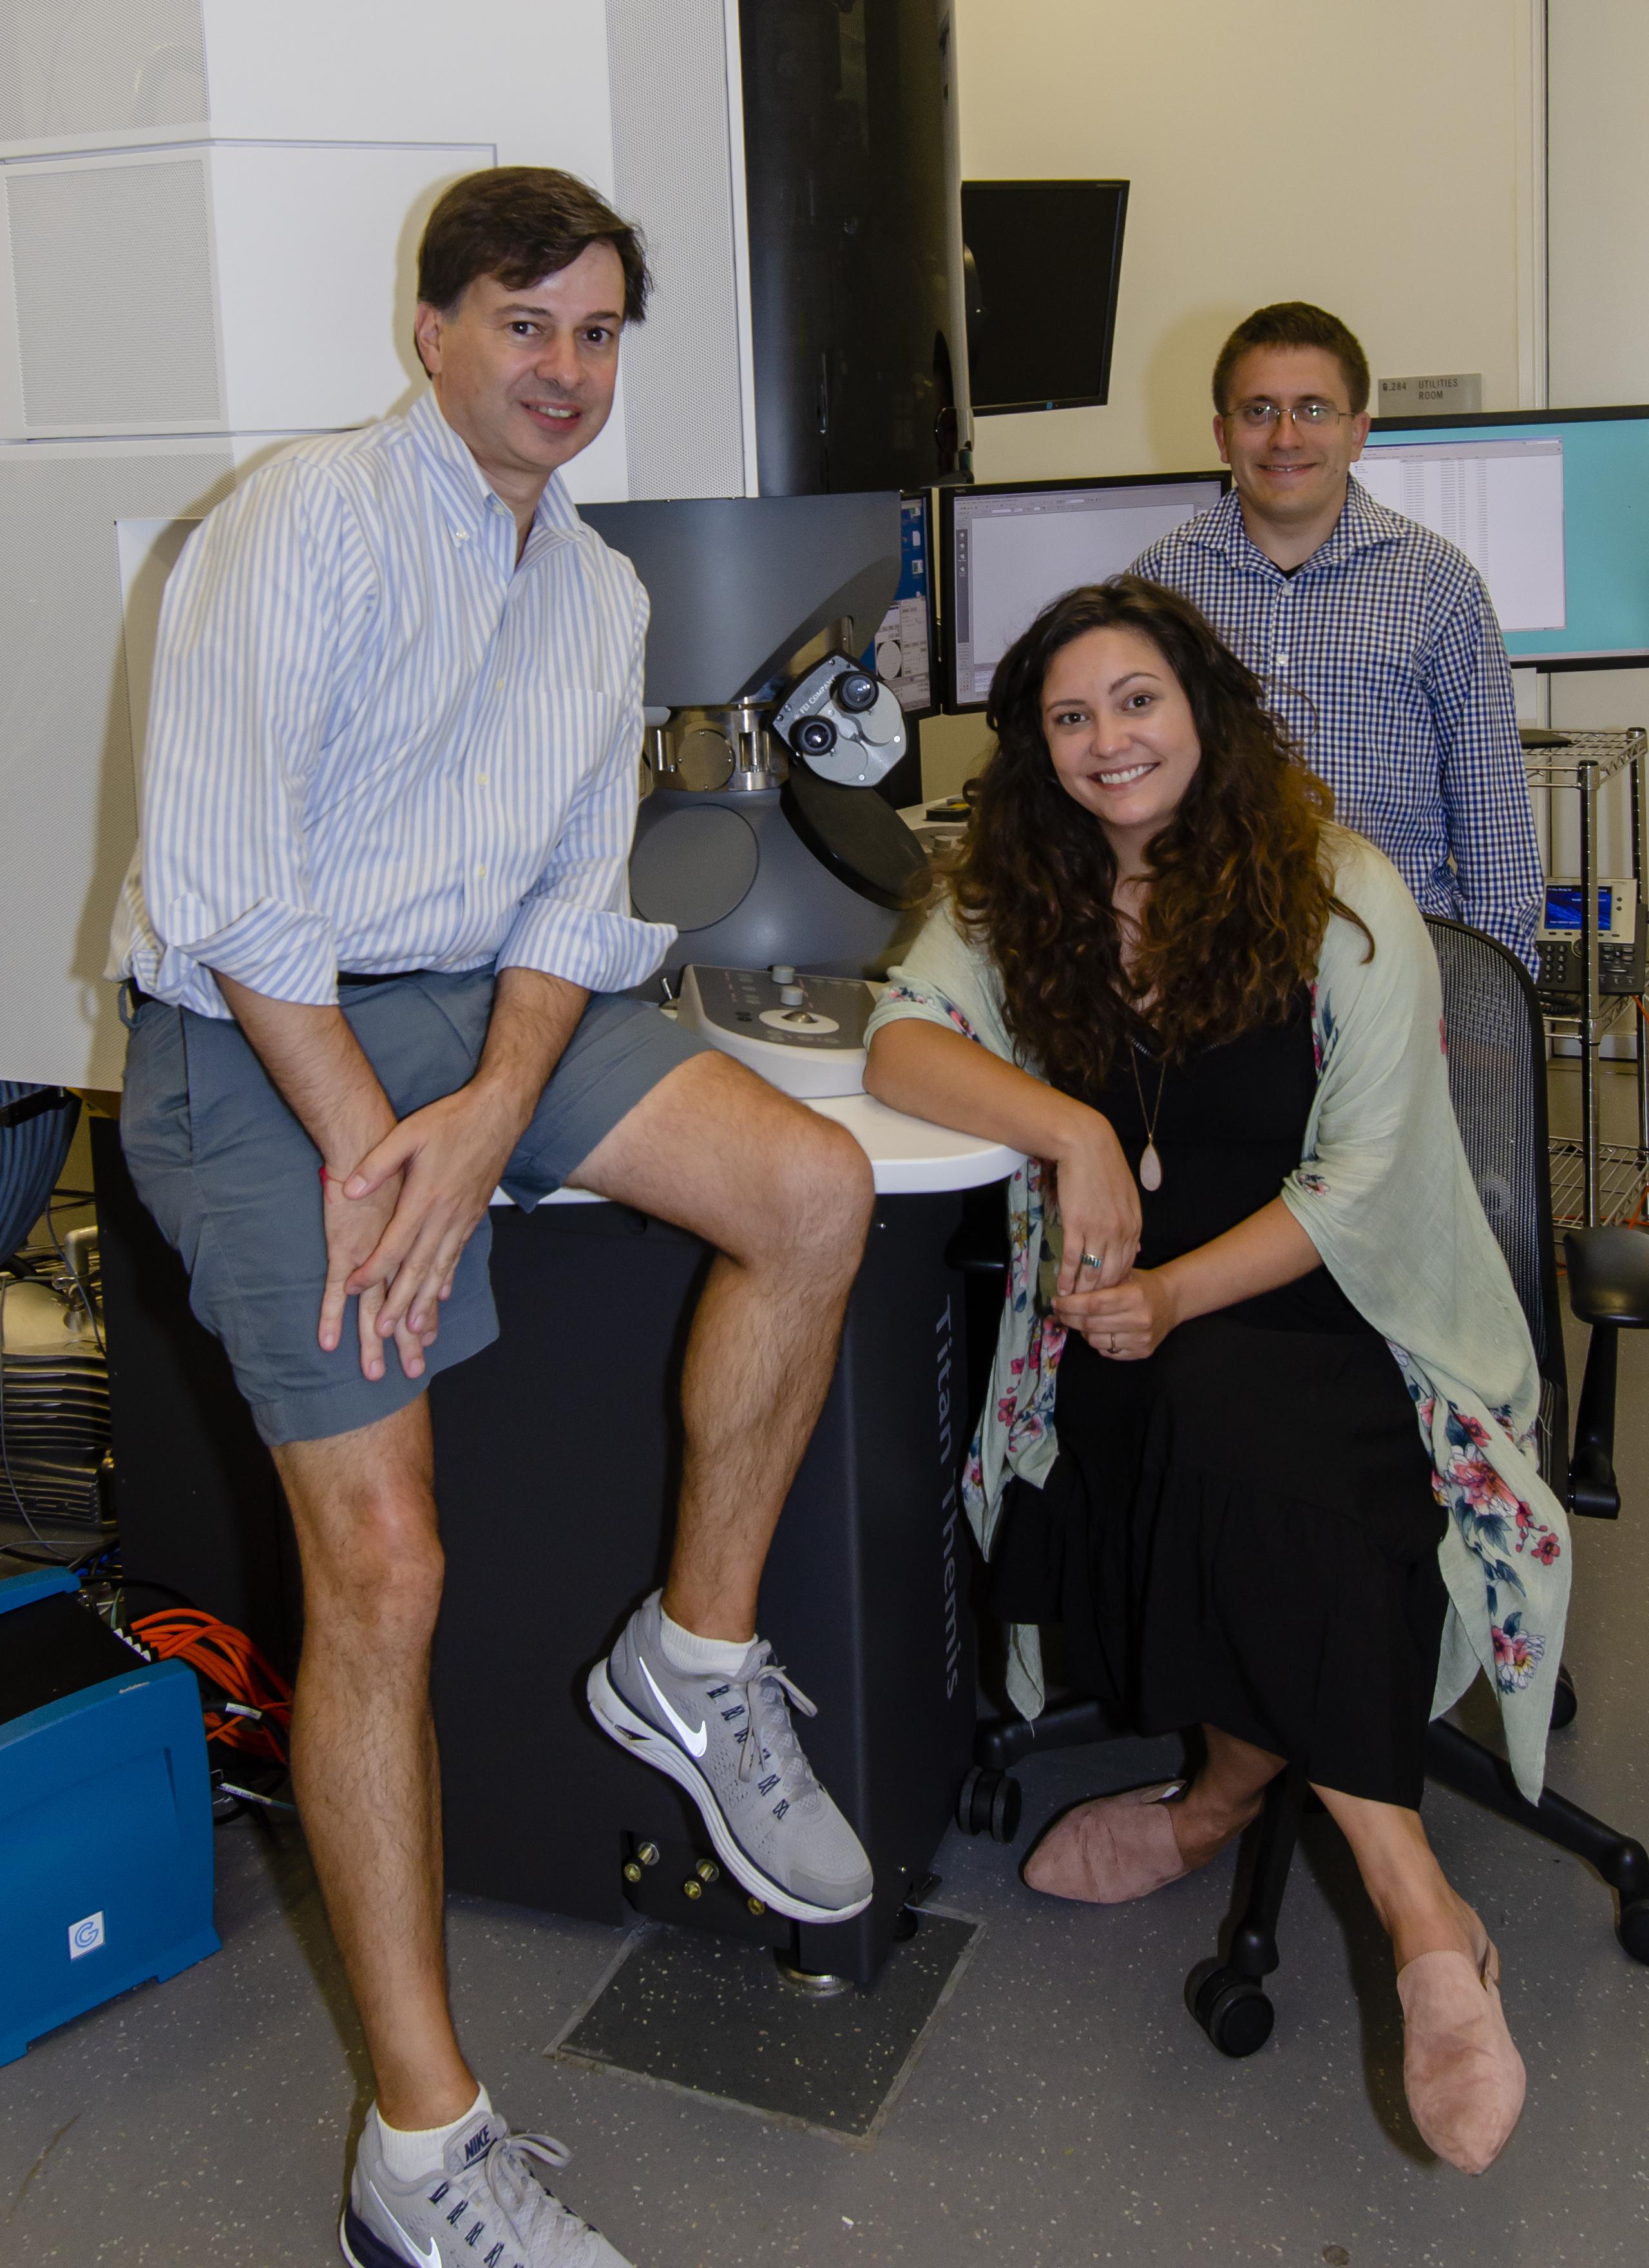 David Jeruzalmi, Jillian Chase, and Silas Harley in the Structural Biology Center